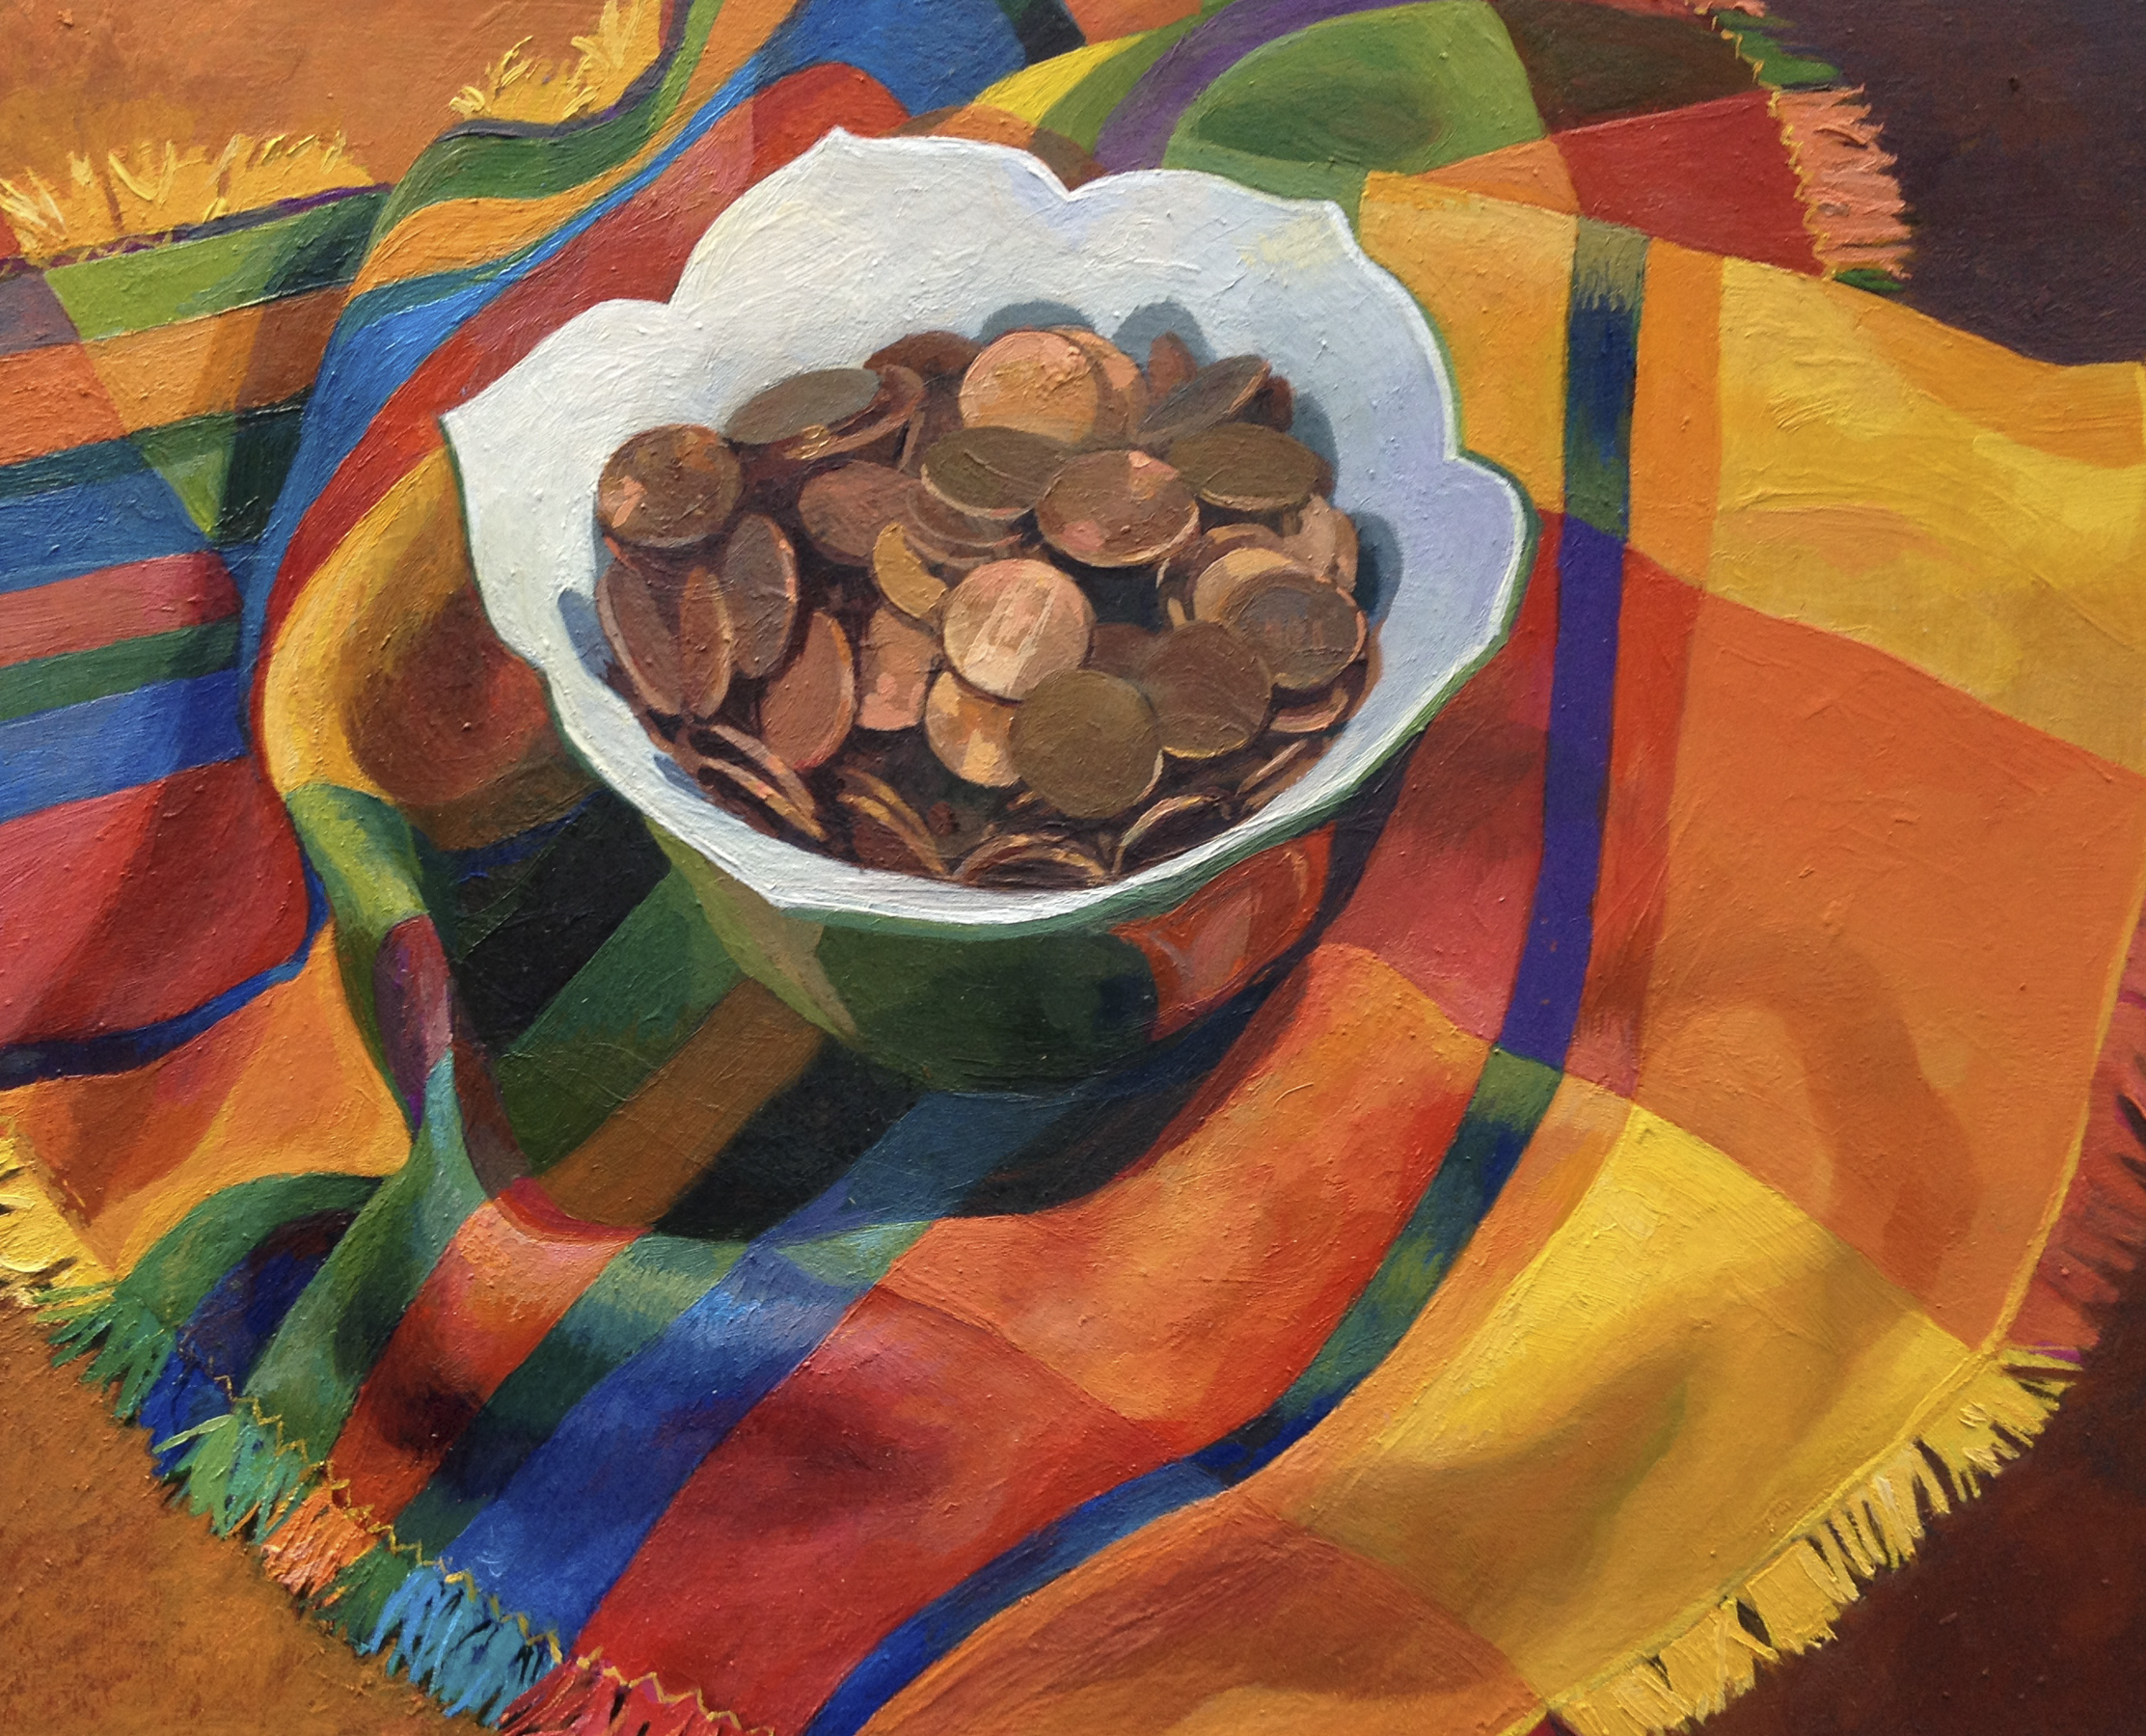 Cohen_Bowl of Pennies.jpg